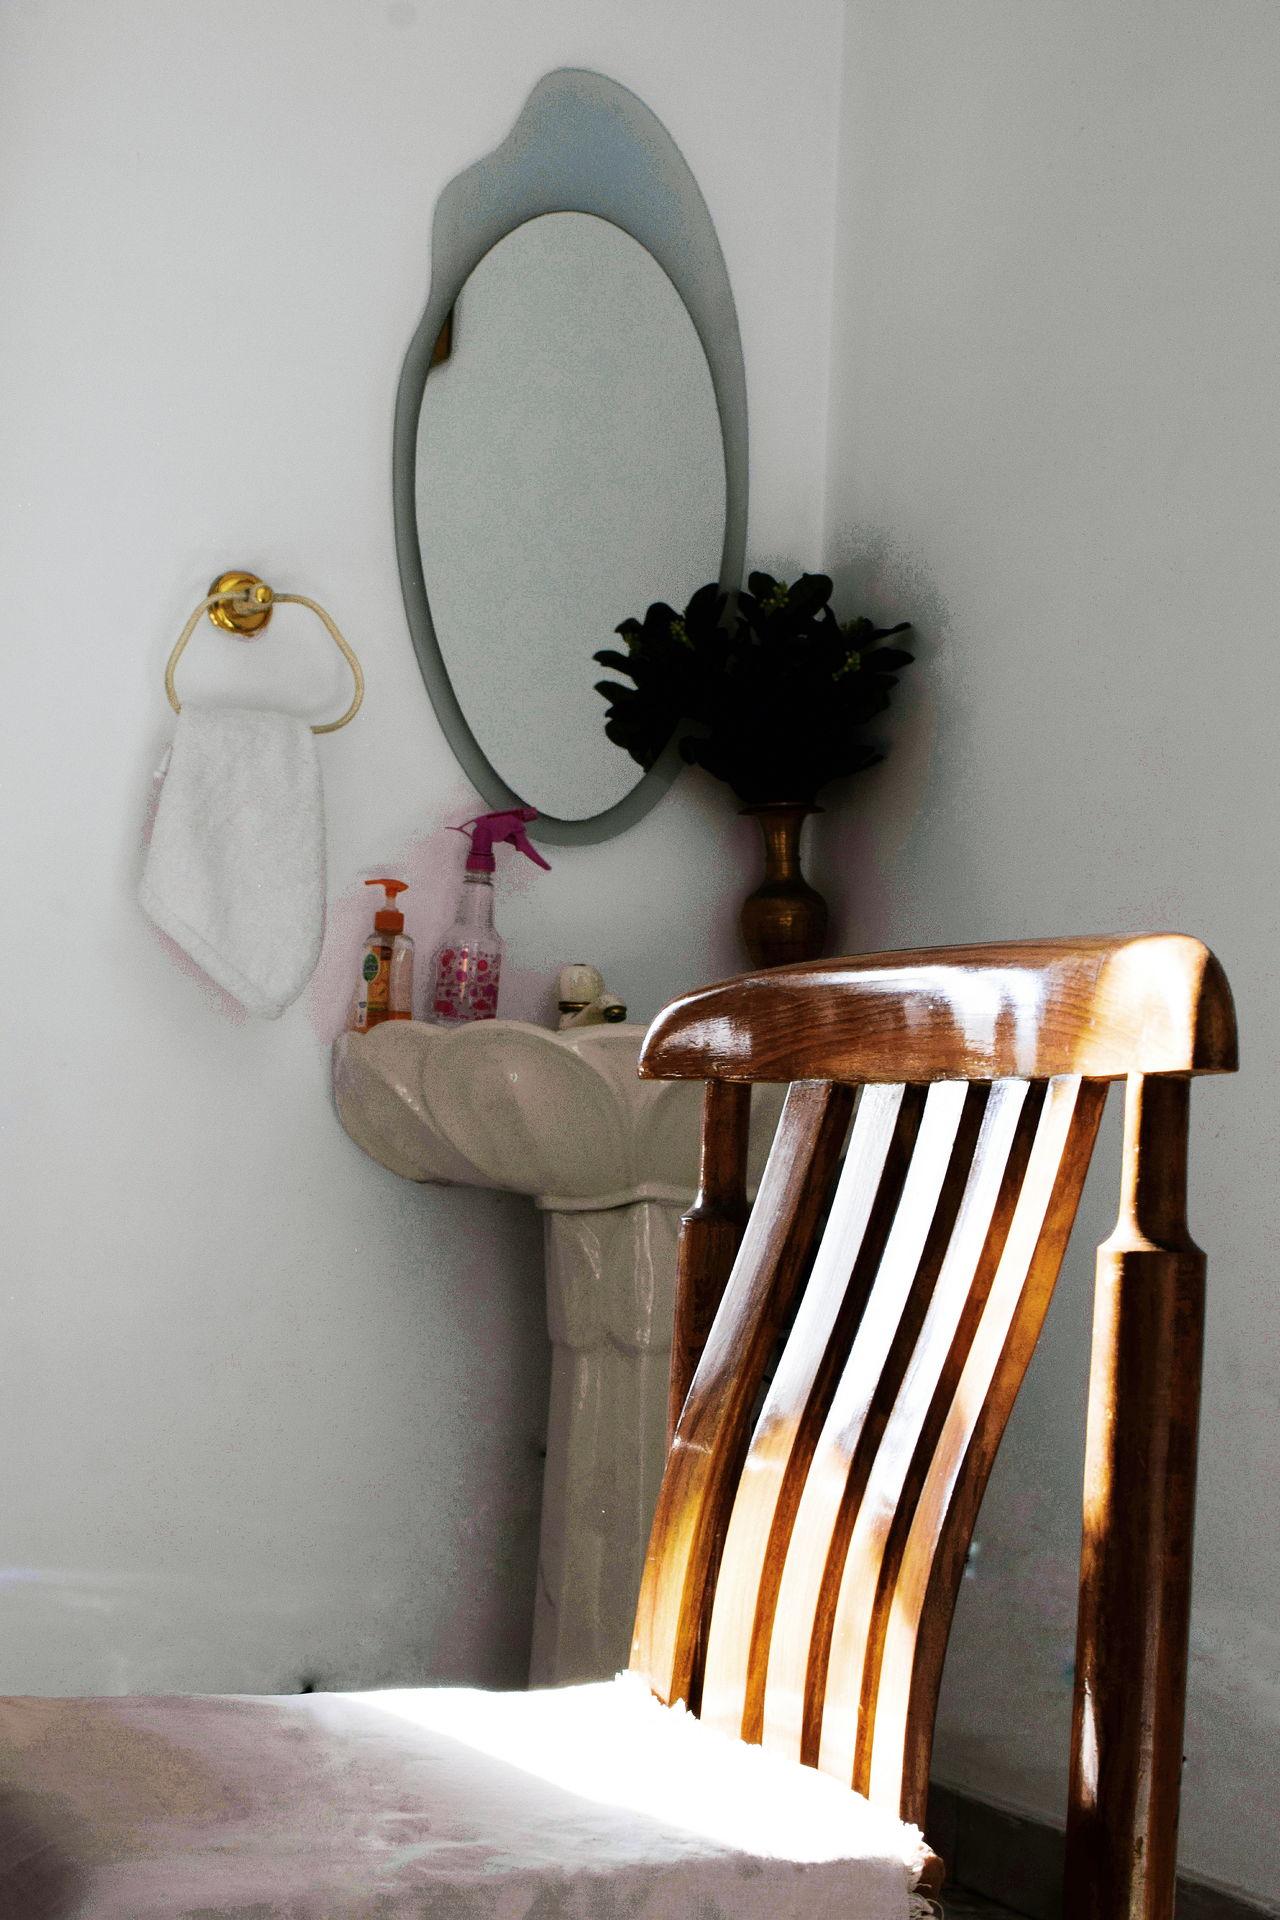 The morning light InMakin! Chair Interior Views Mirror Sunlight Rays Of Light Rays Of Sunlight Rays Of Sunshine Randomness EyeEm Selects